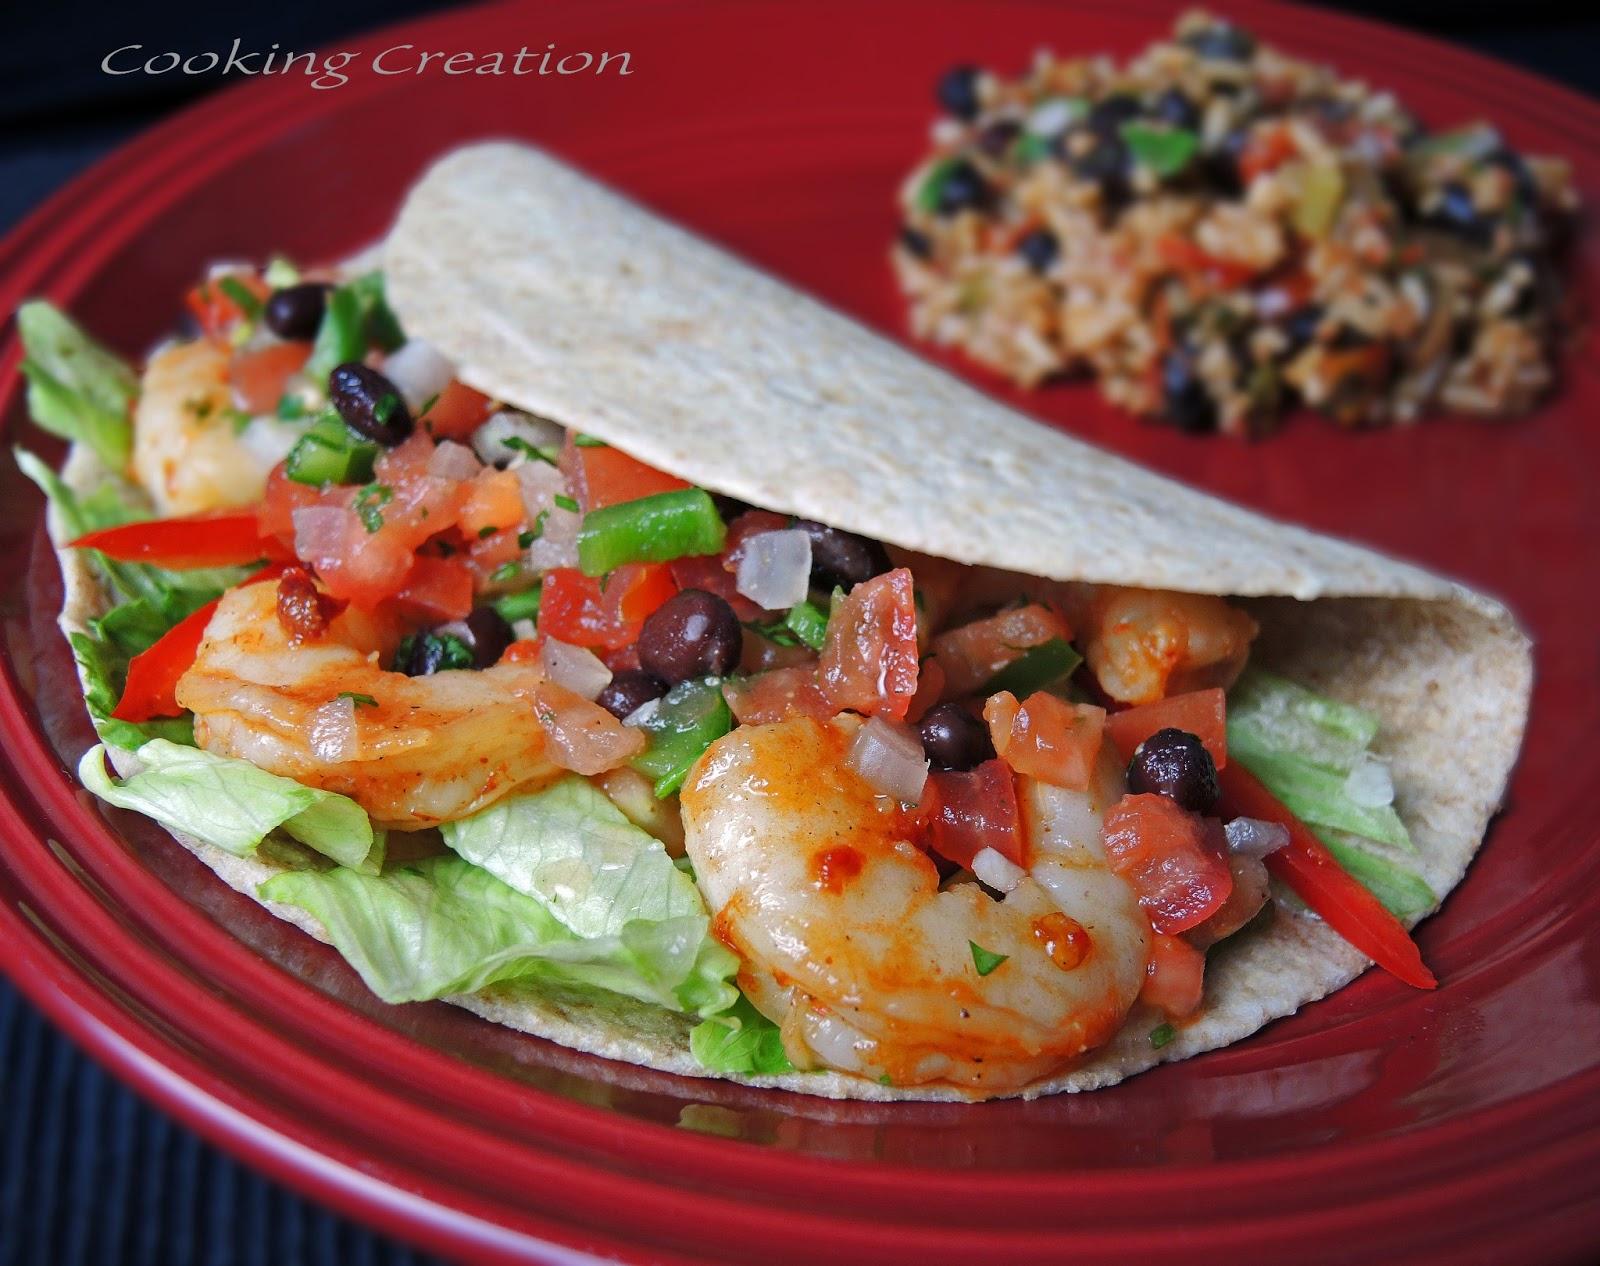 Cooking Creation: Chipotle Shrimp Tacos with Black Bean Pico de Gallo